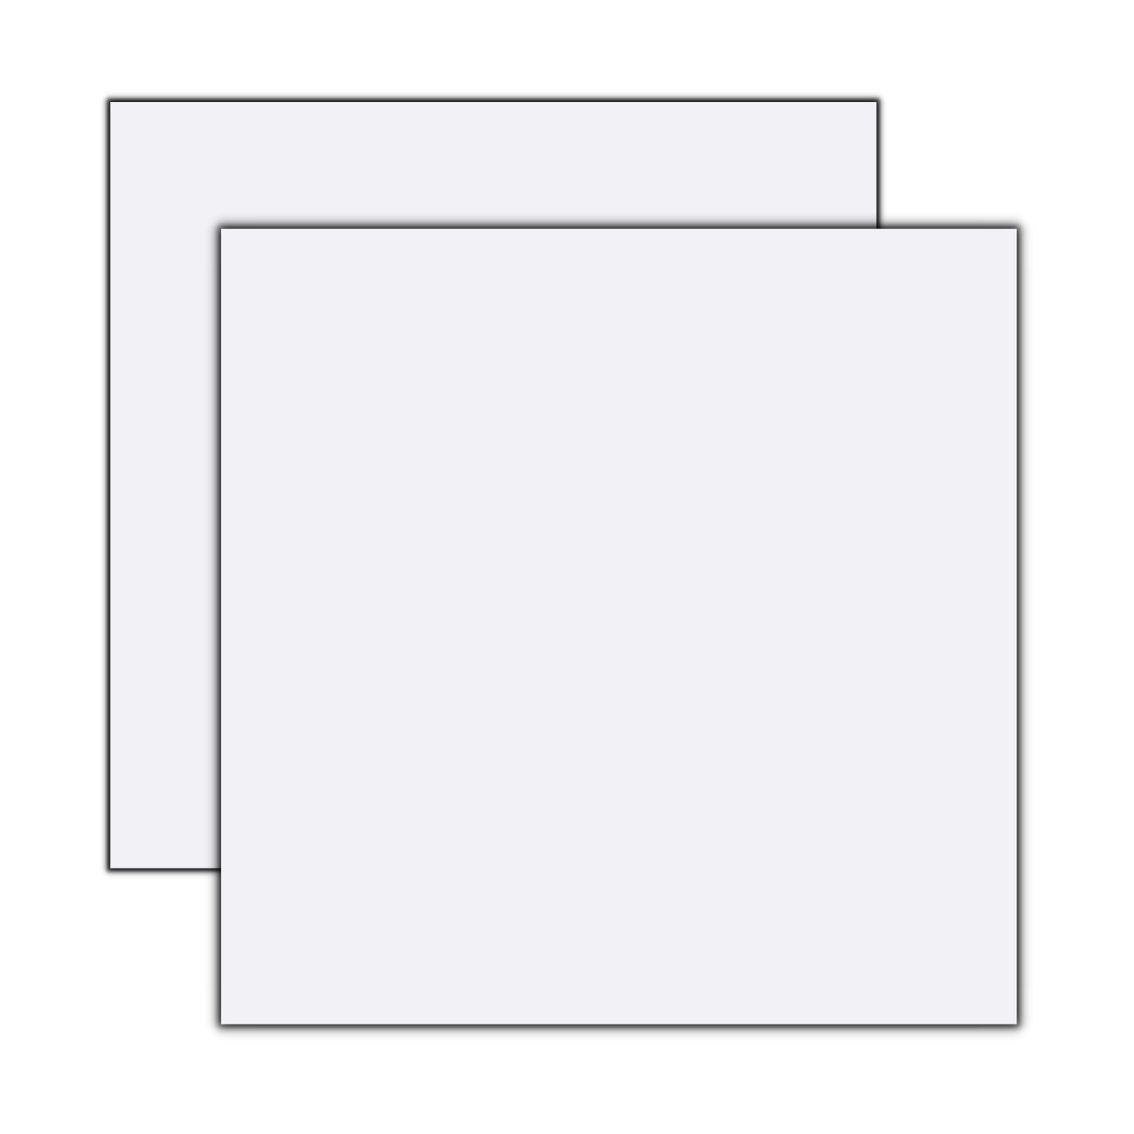 Cotton Polido 84x84 cm <br /><b>R$ 93,00 M² </b><br />Cx 2,12 M² <b> R$ 197,16</b>